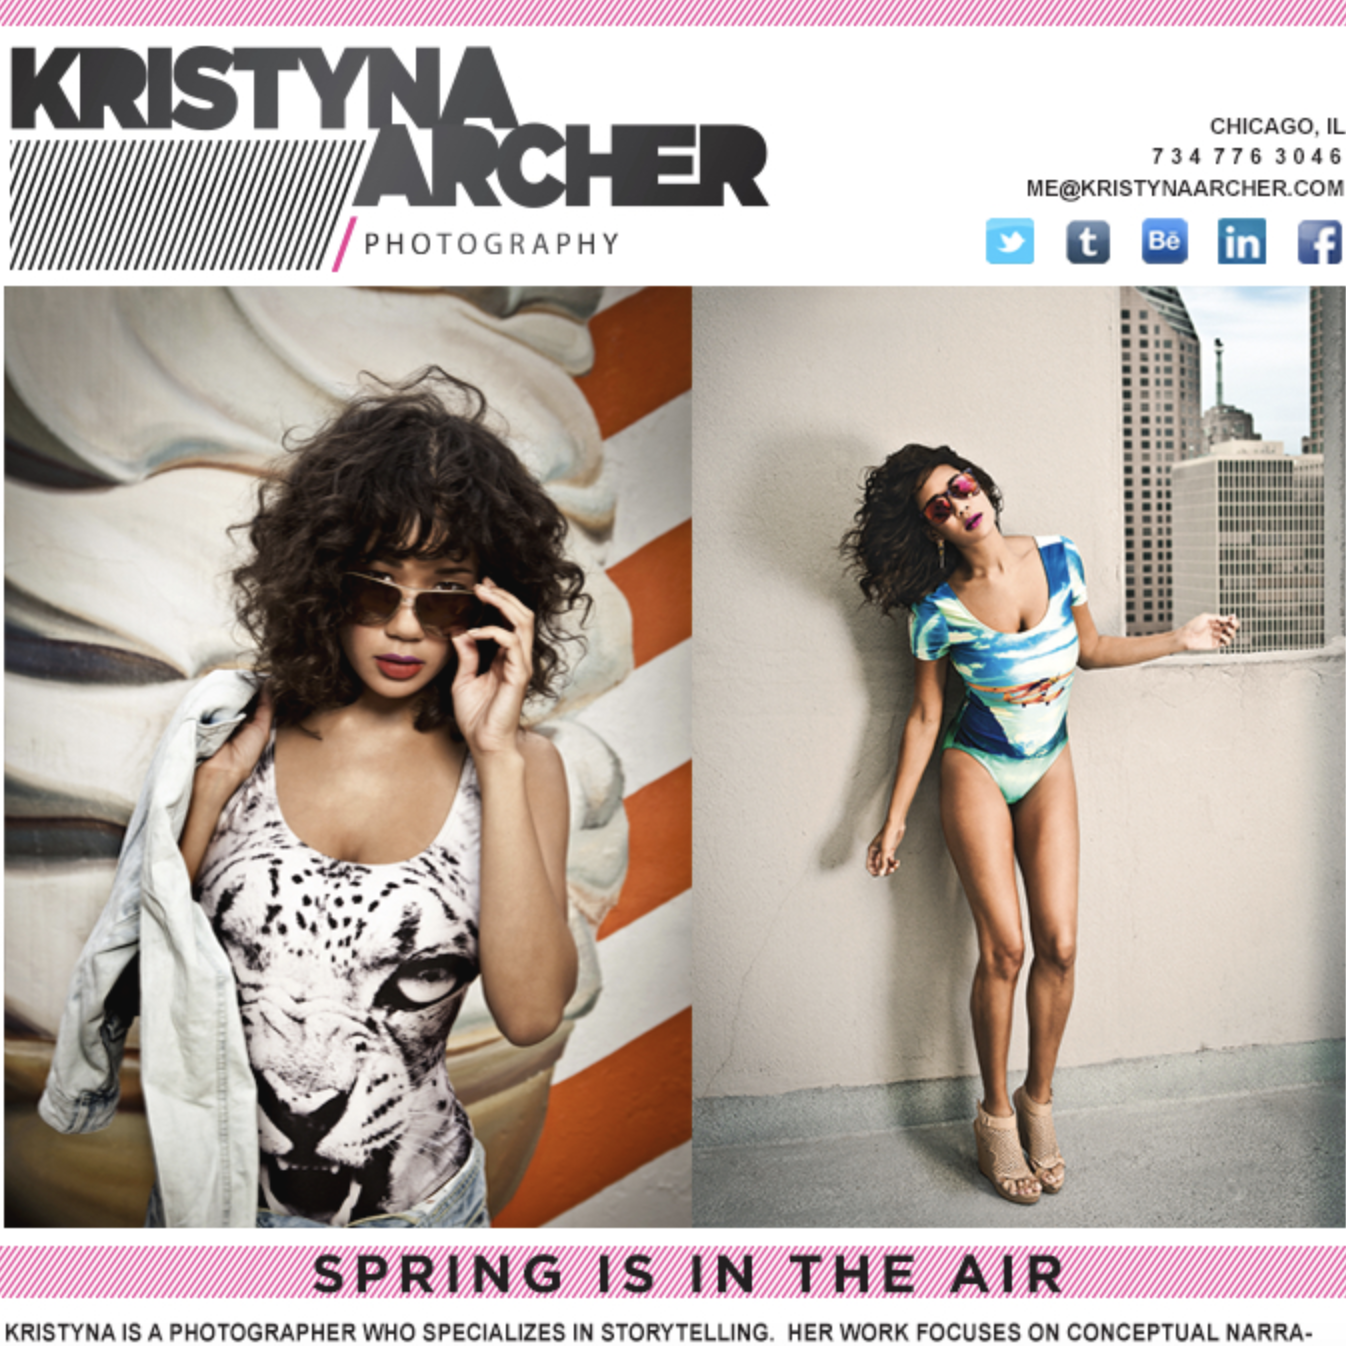 Design: Kristyna Archer Springs Forward